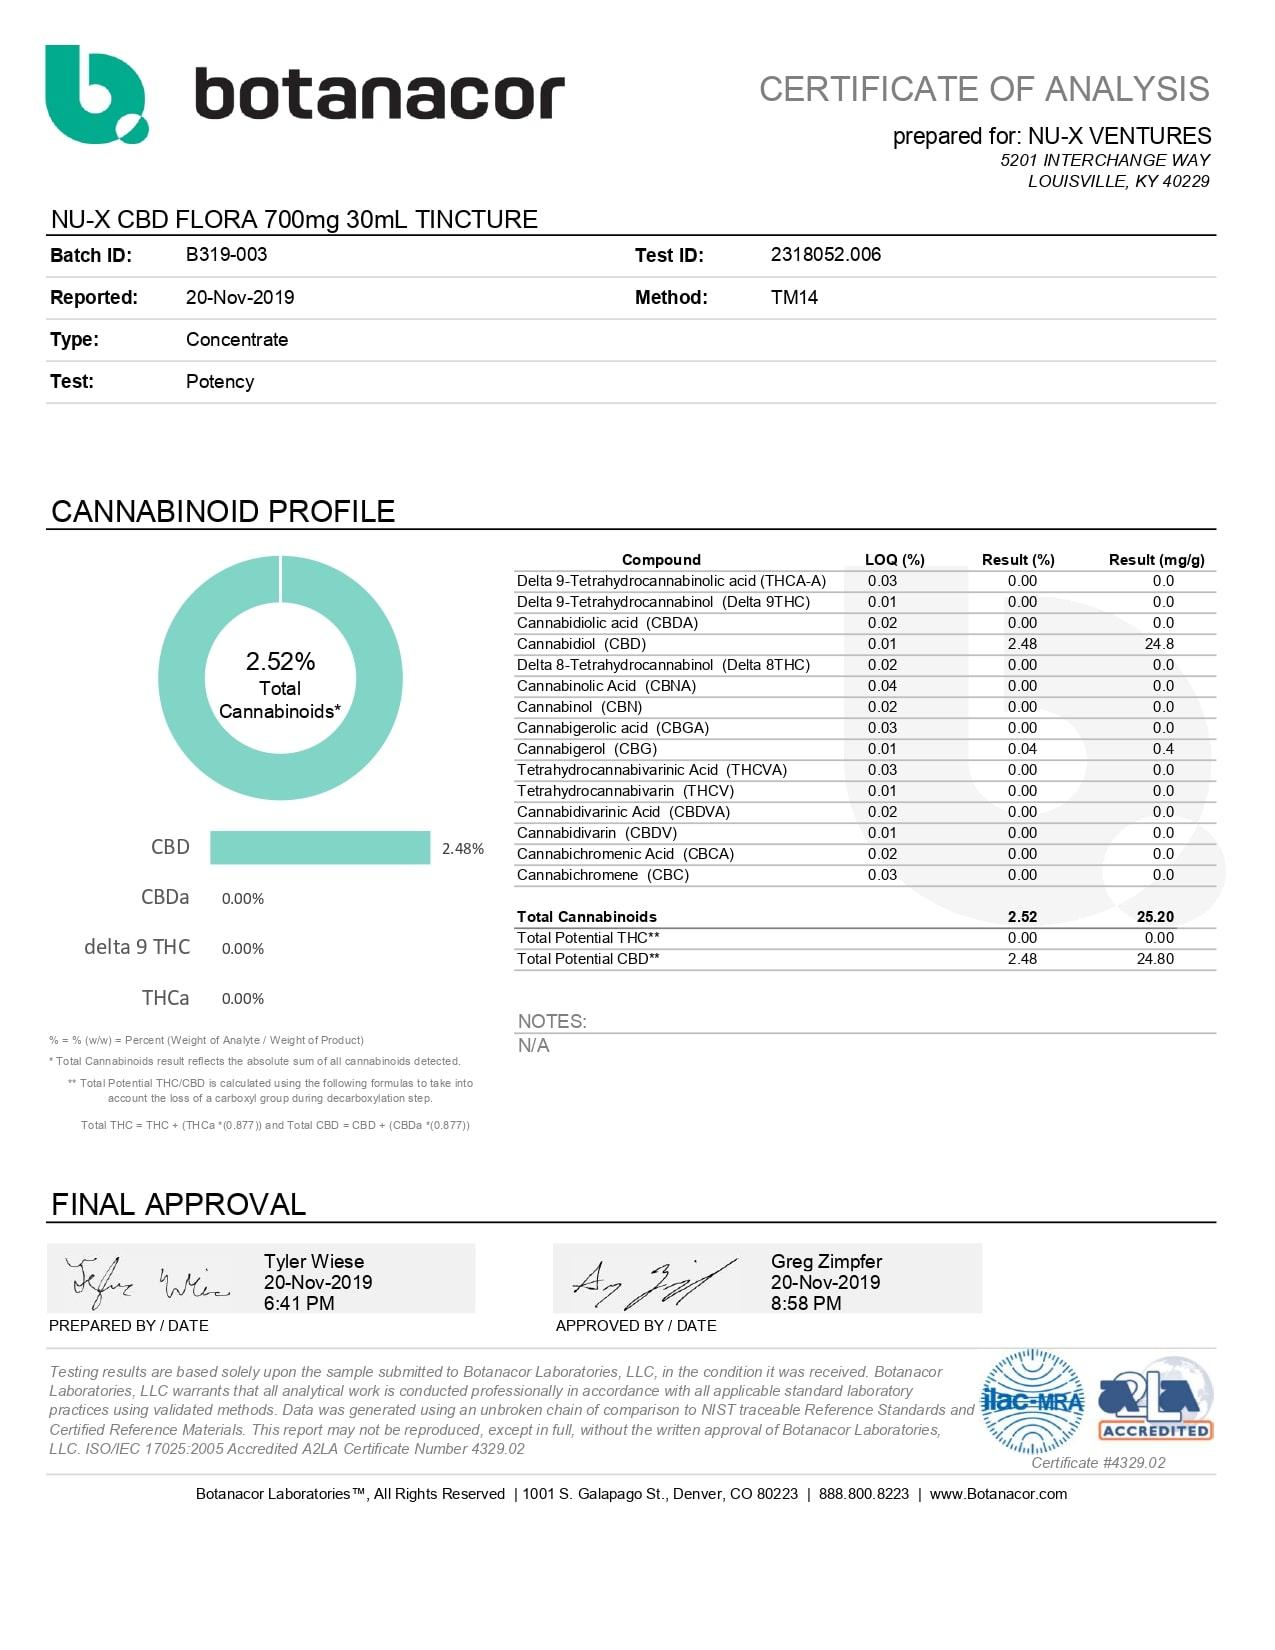 NU-X CBD Tincture Lab Report Flora Citrus 700mg